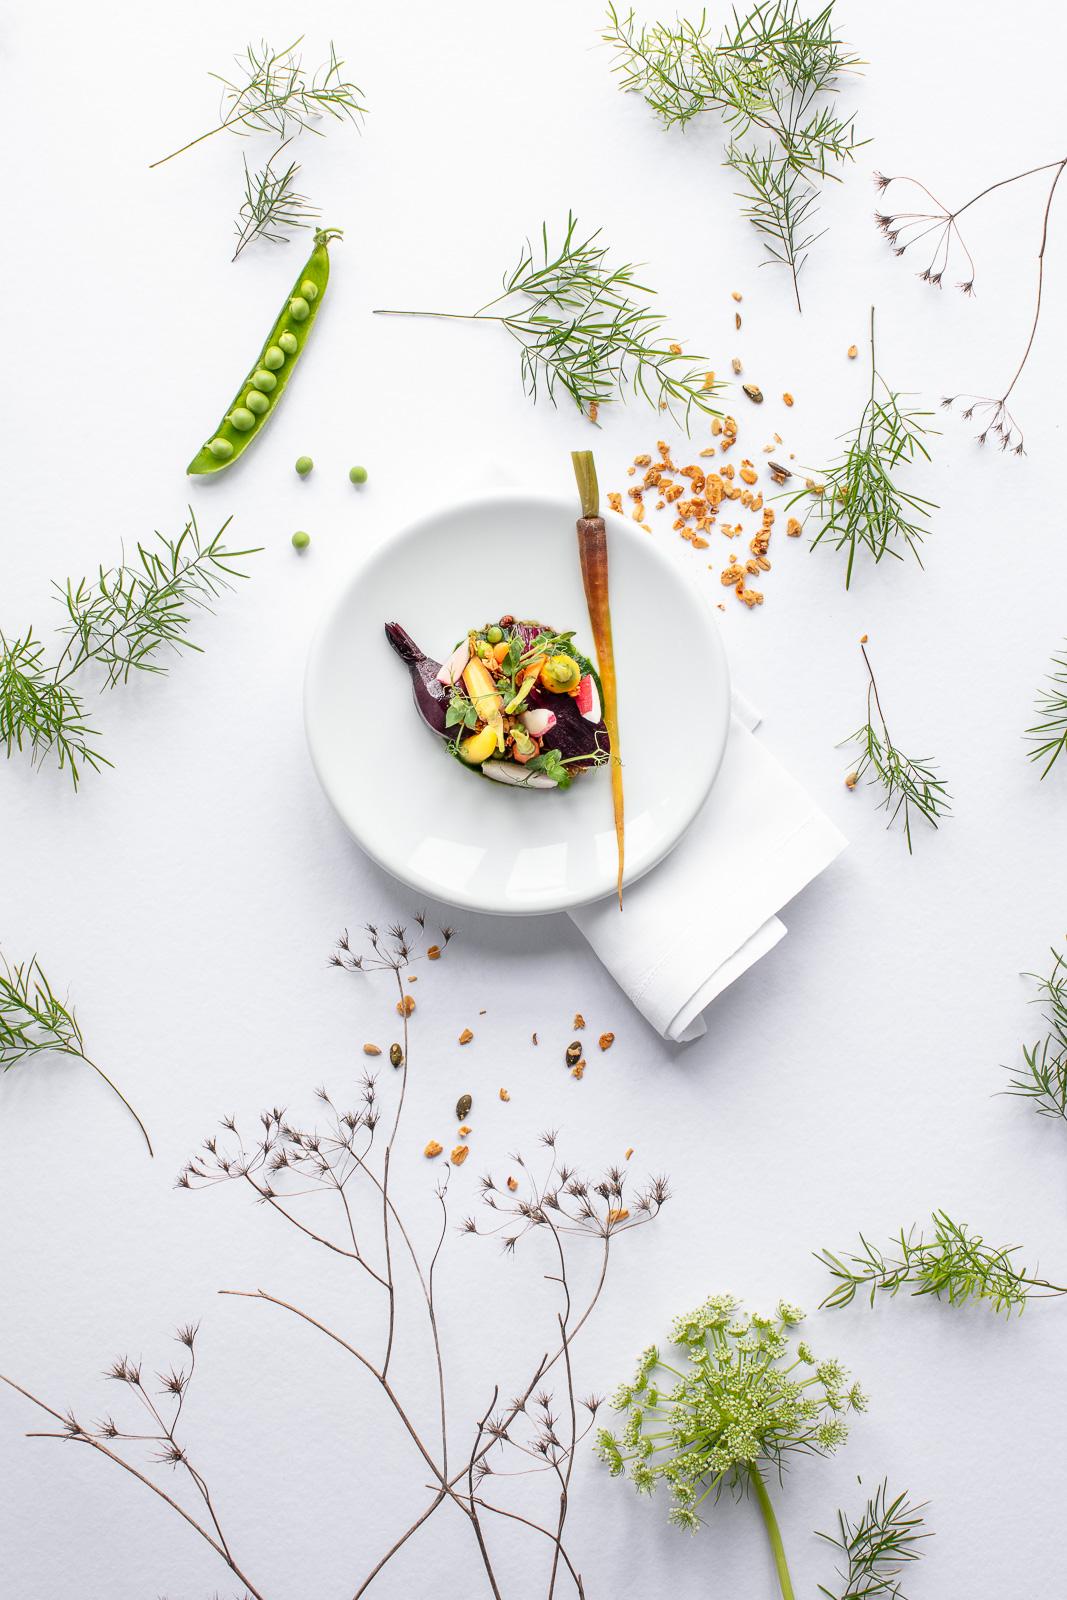 Franck_Hamel_food_photographer_photographeculinaire_valerie_paumelle_agent_st_clair_traiteur (16).jpg